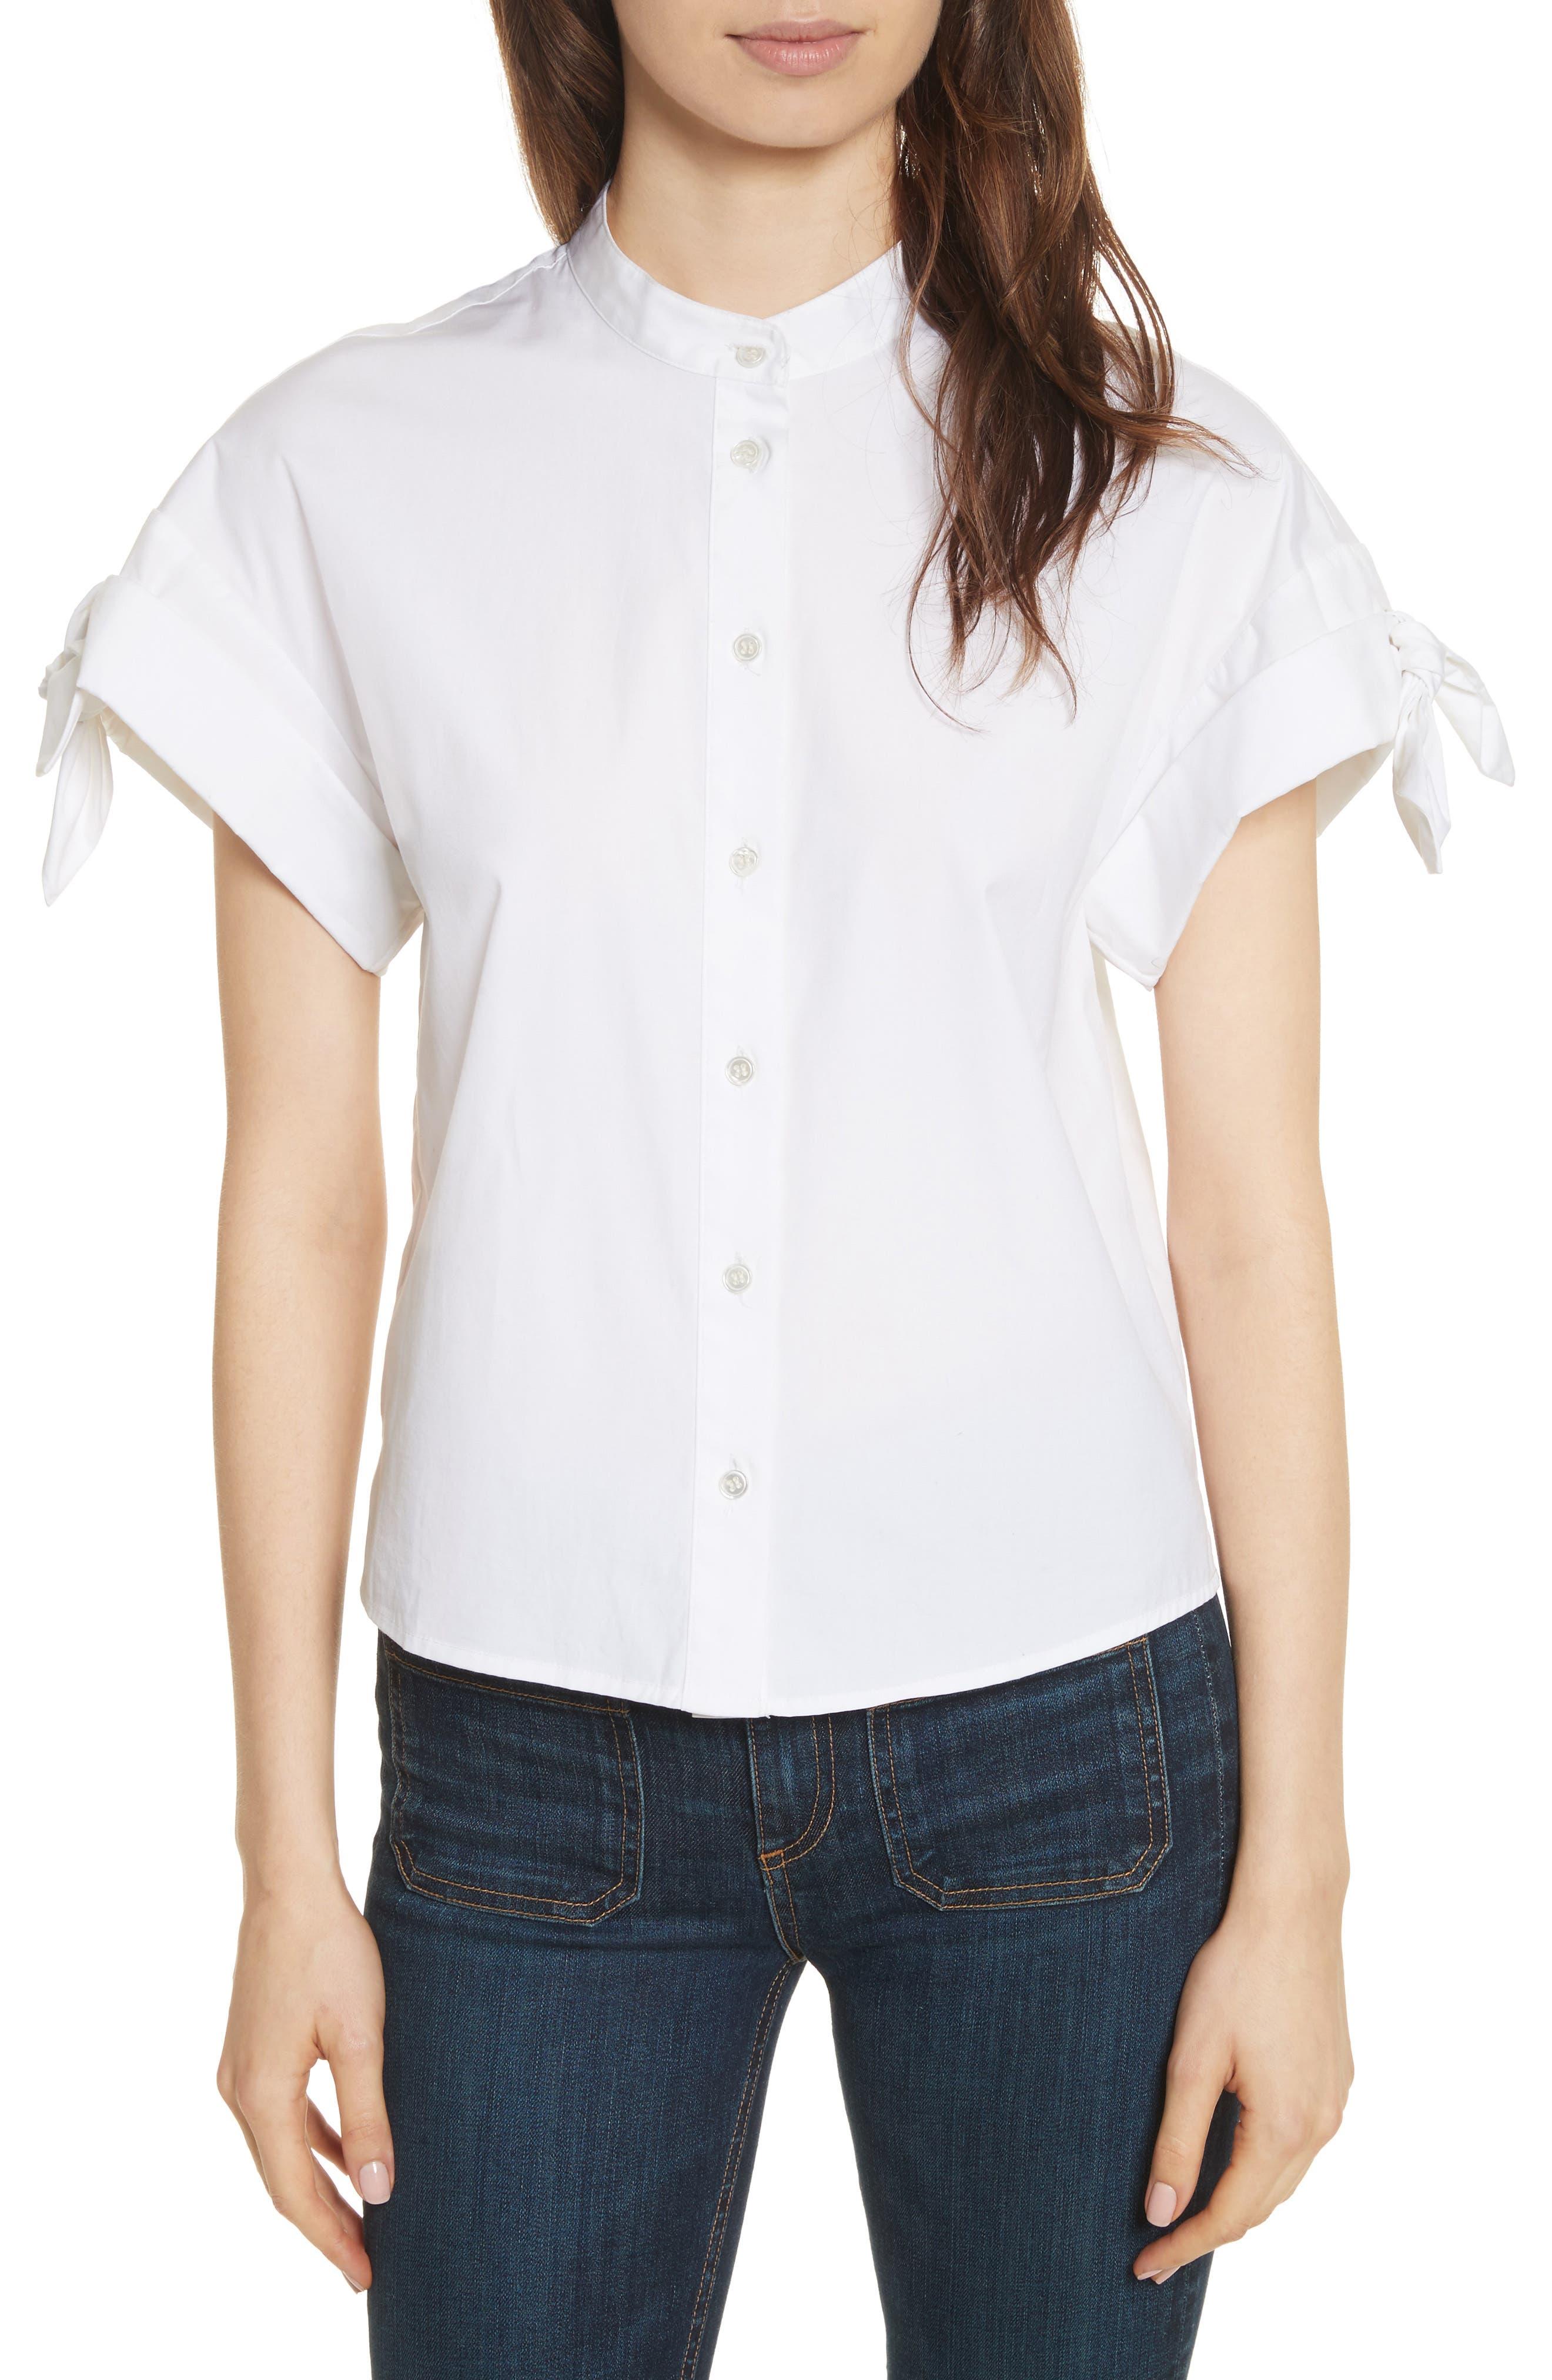 Veronica Beard Sanaa Stretch Cotton Shirt